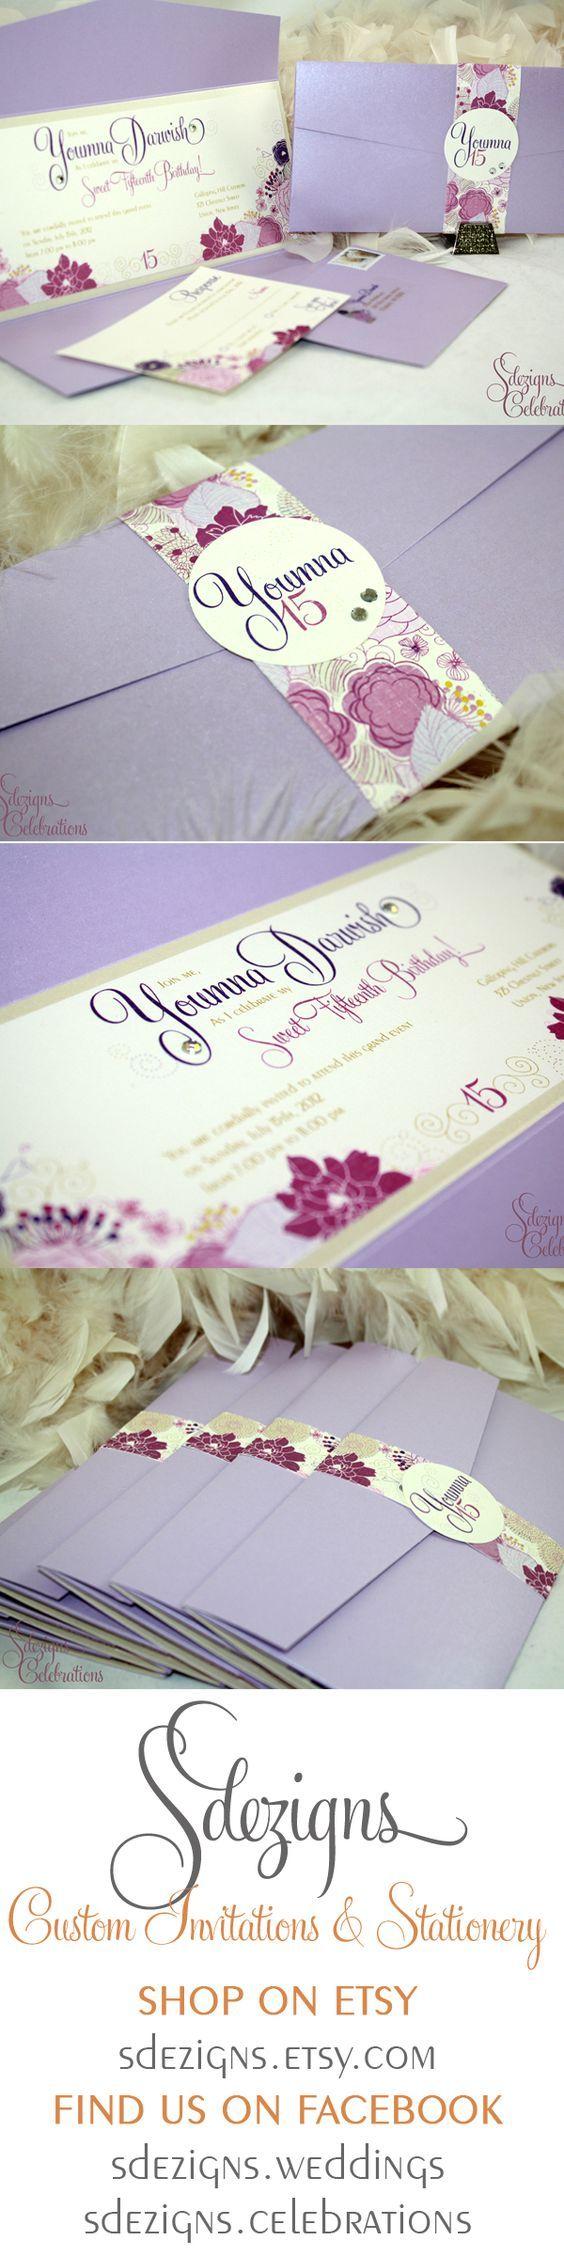 best decoración fiesta vintage images on pinterest invitations